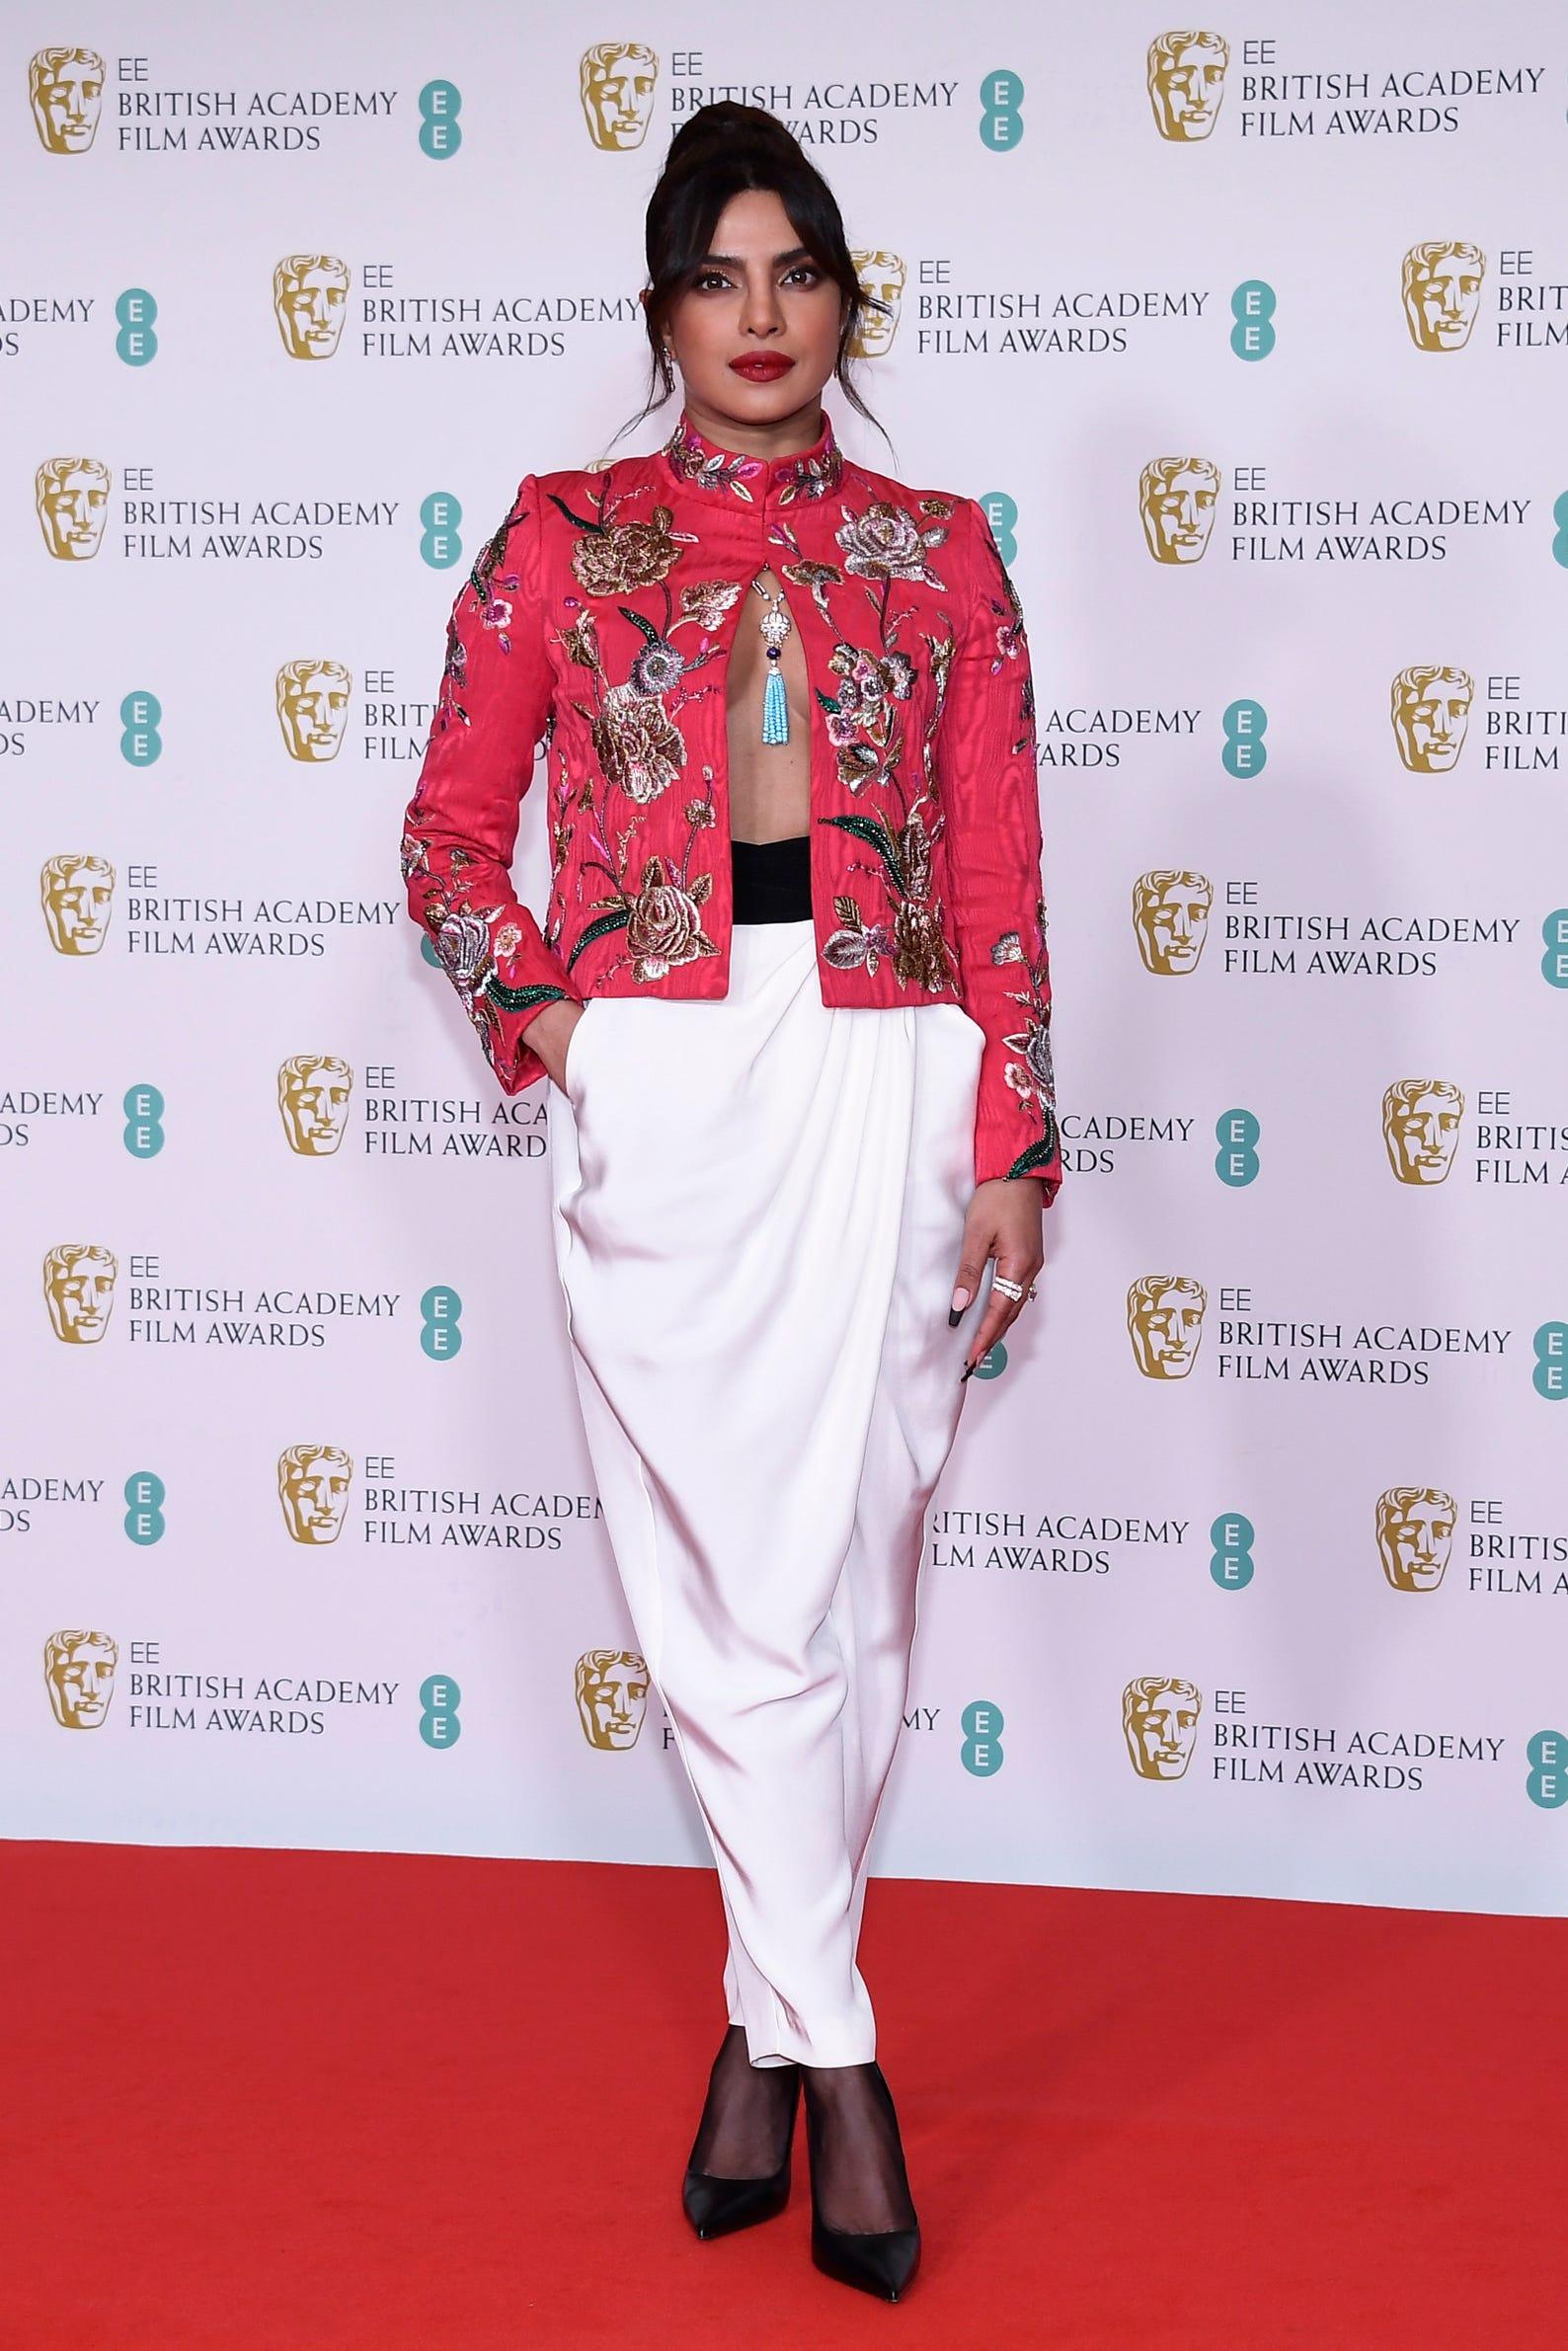 BAFTA Awards red carpet: Priyanka Chopra Jonas, Phoebe Dynevor, more